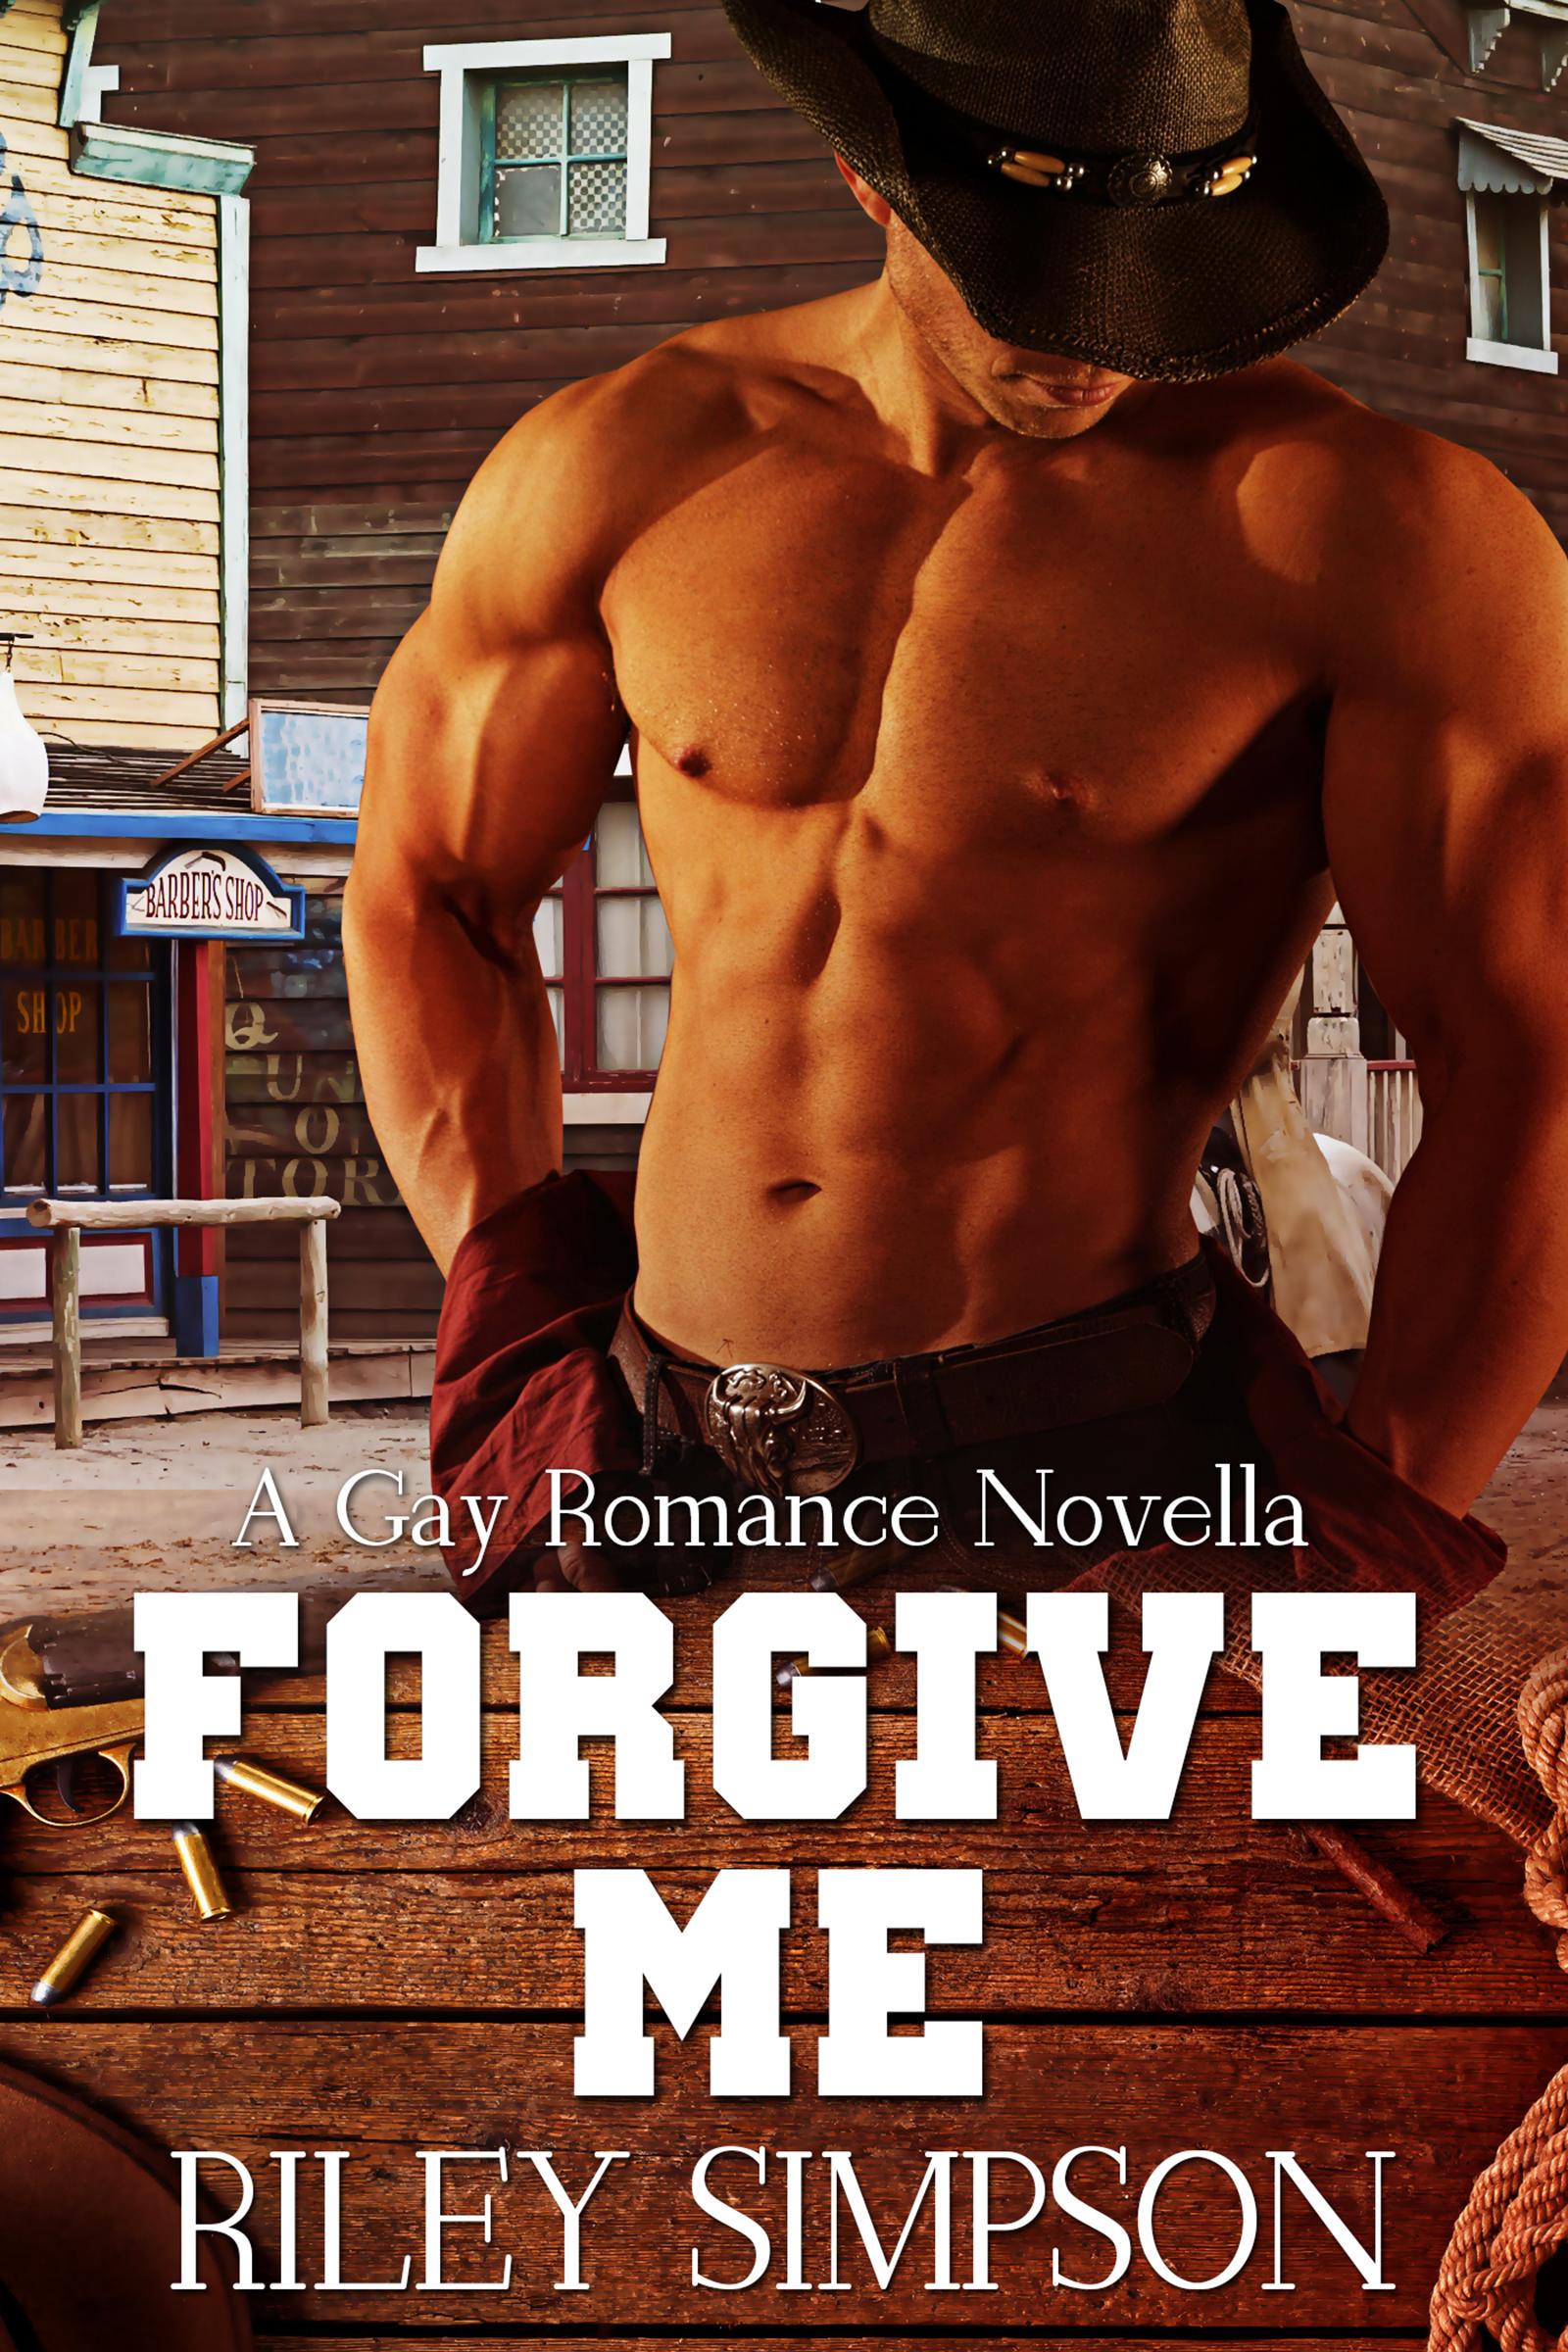 Riley Simpson  Forgive Me  A Gay Romance Novella